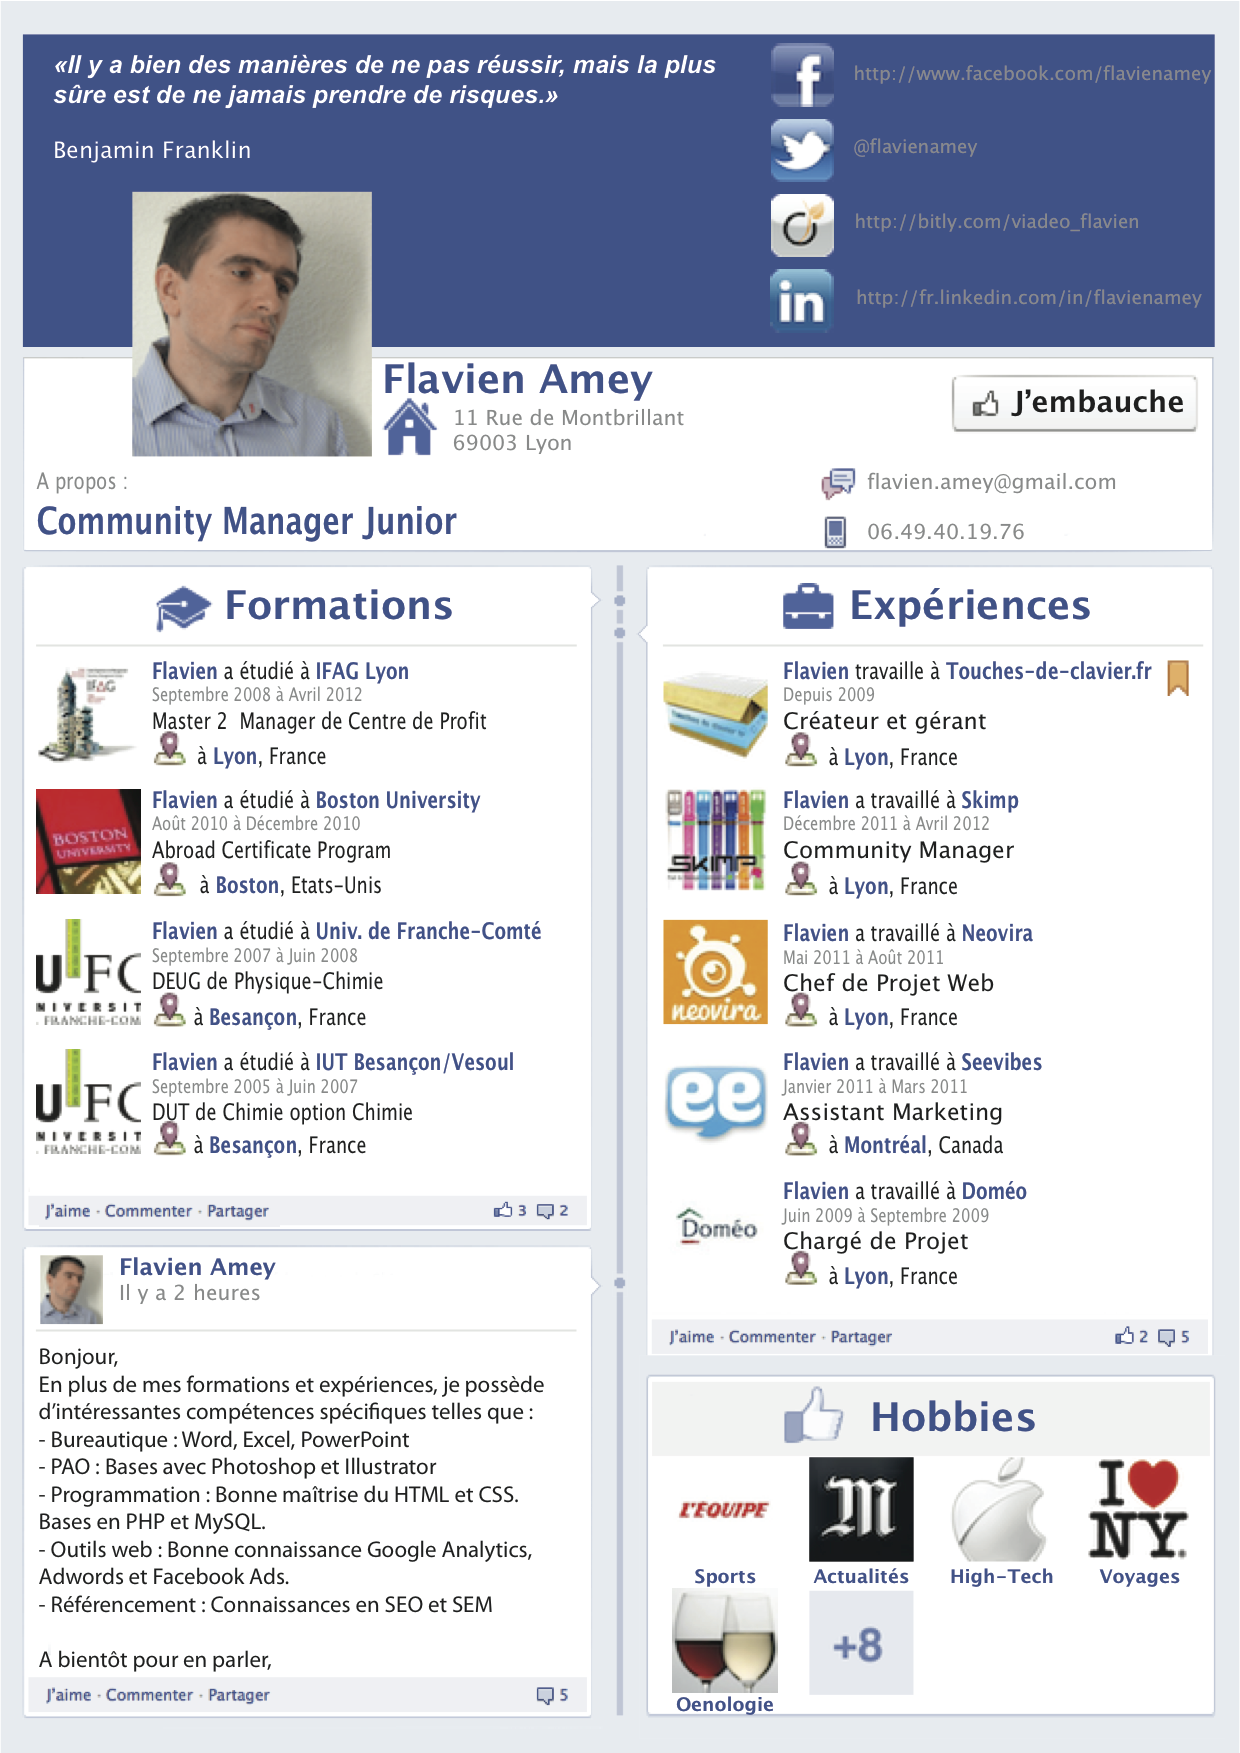 Pin By Ylle Ylle On Marketing Community Manager Social Media Facebook Timeline Job Cv